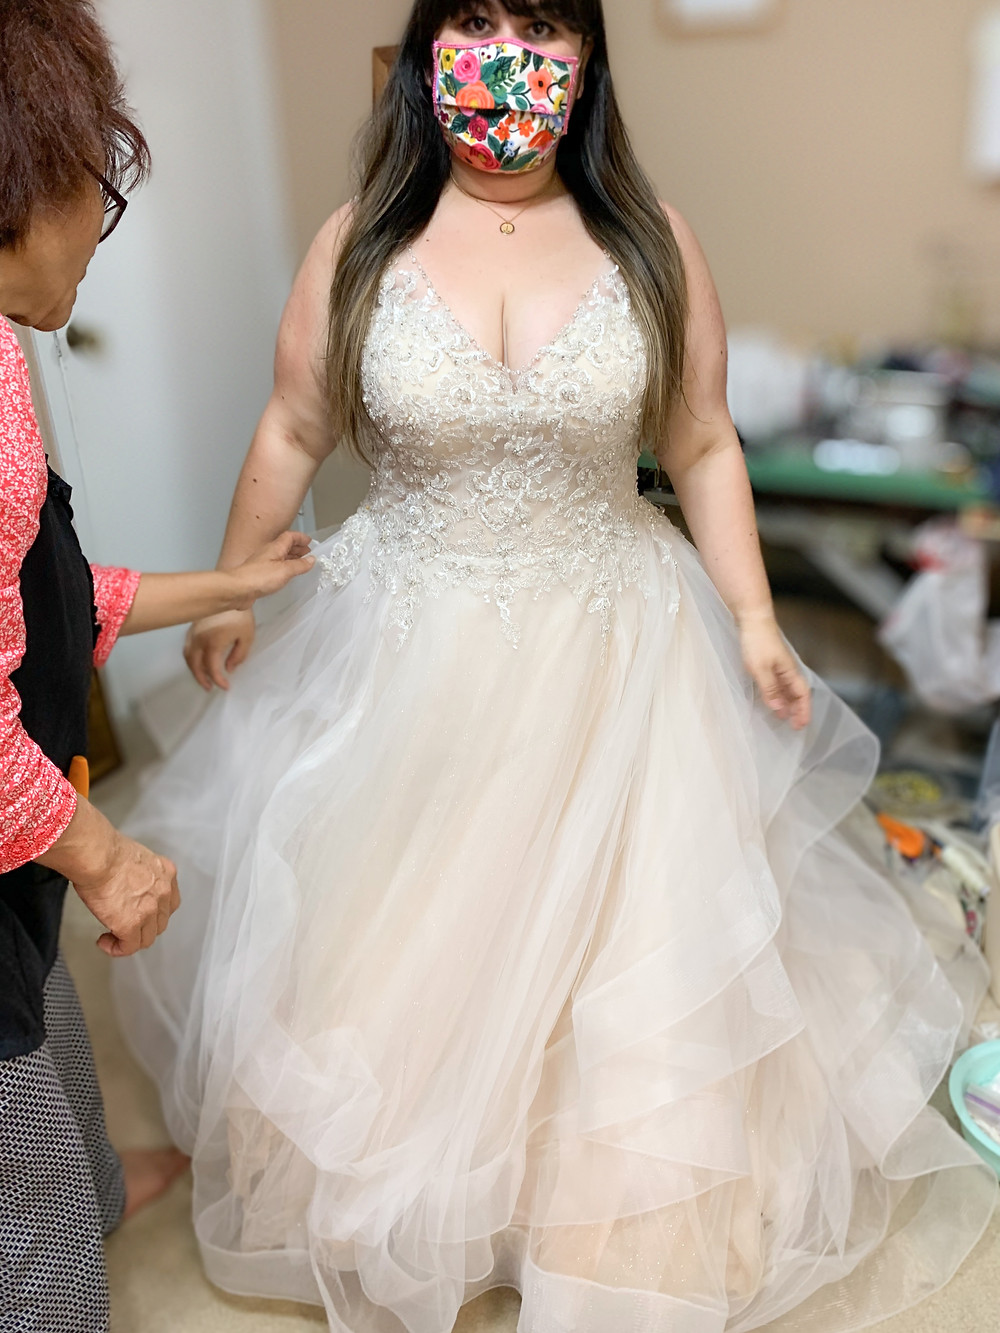 80 Pound weight loss wedding dress bride